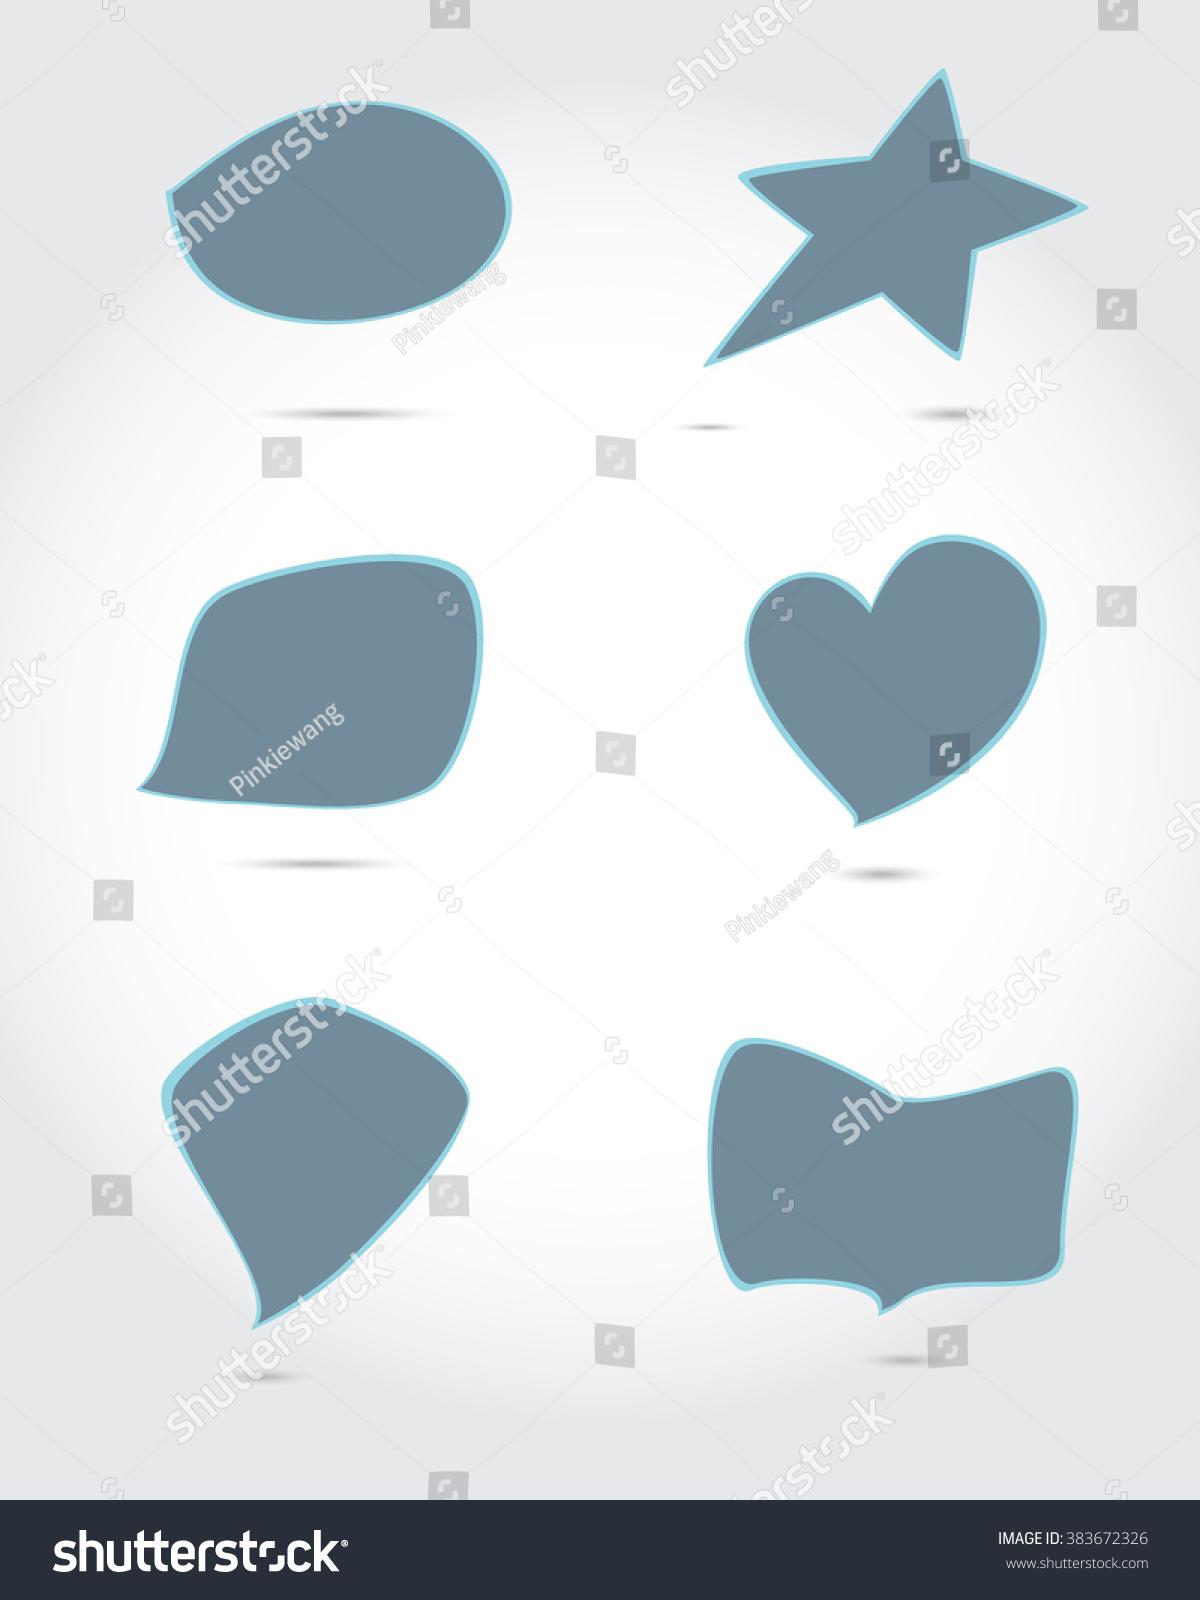 Six Types Speech Box Blue Color Stock Vector 383672326 - Shutterstock